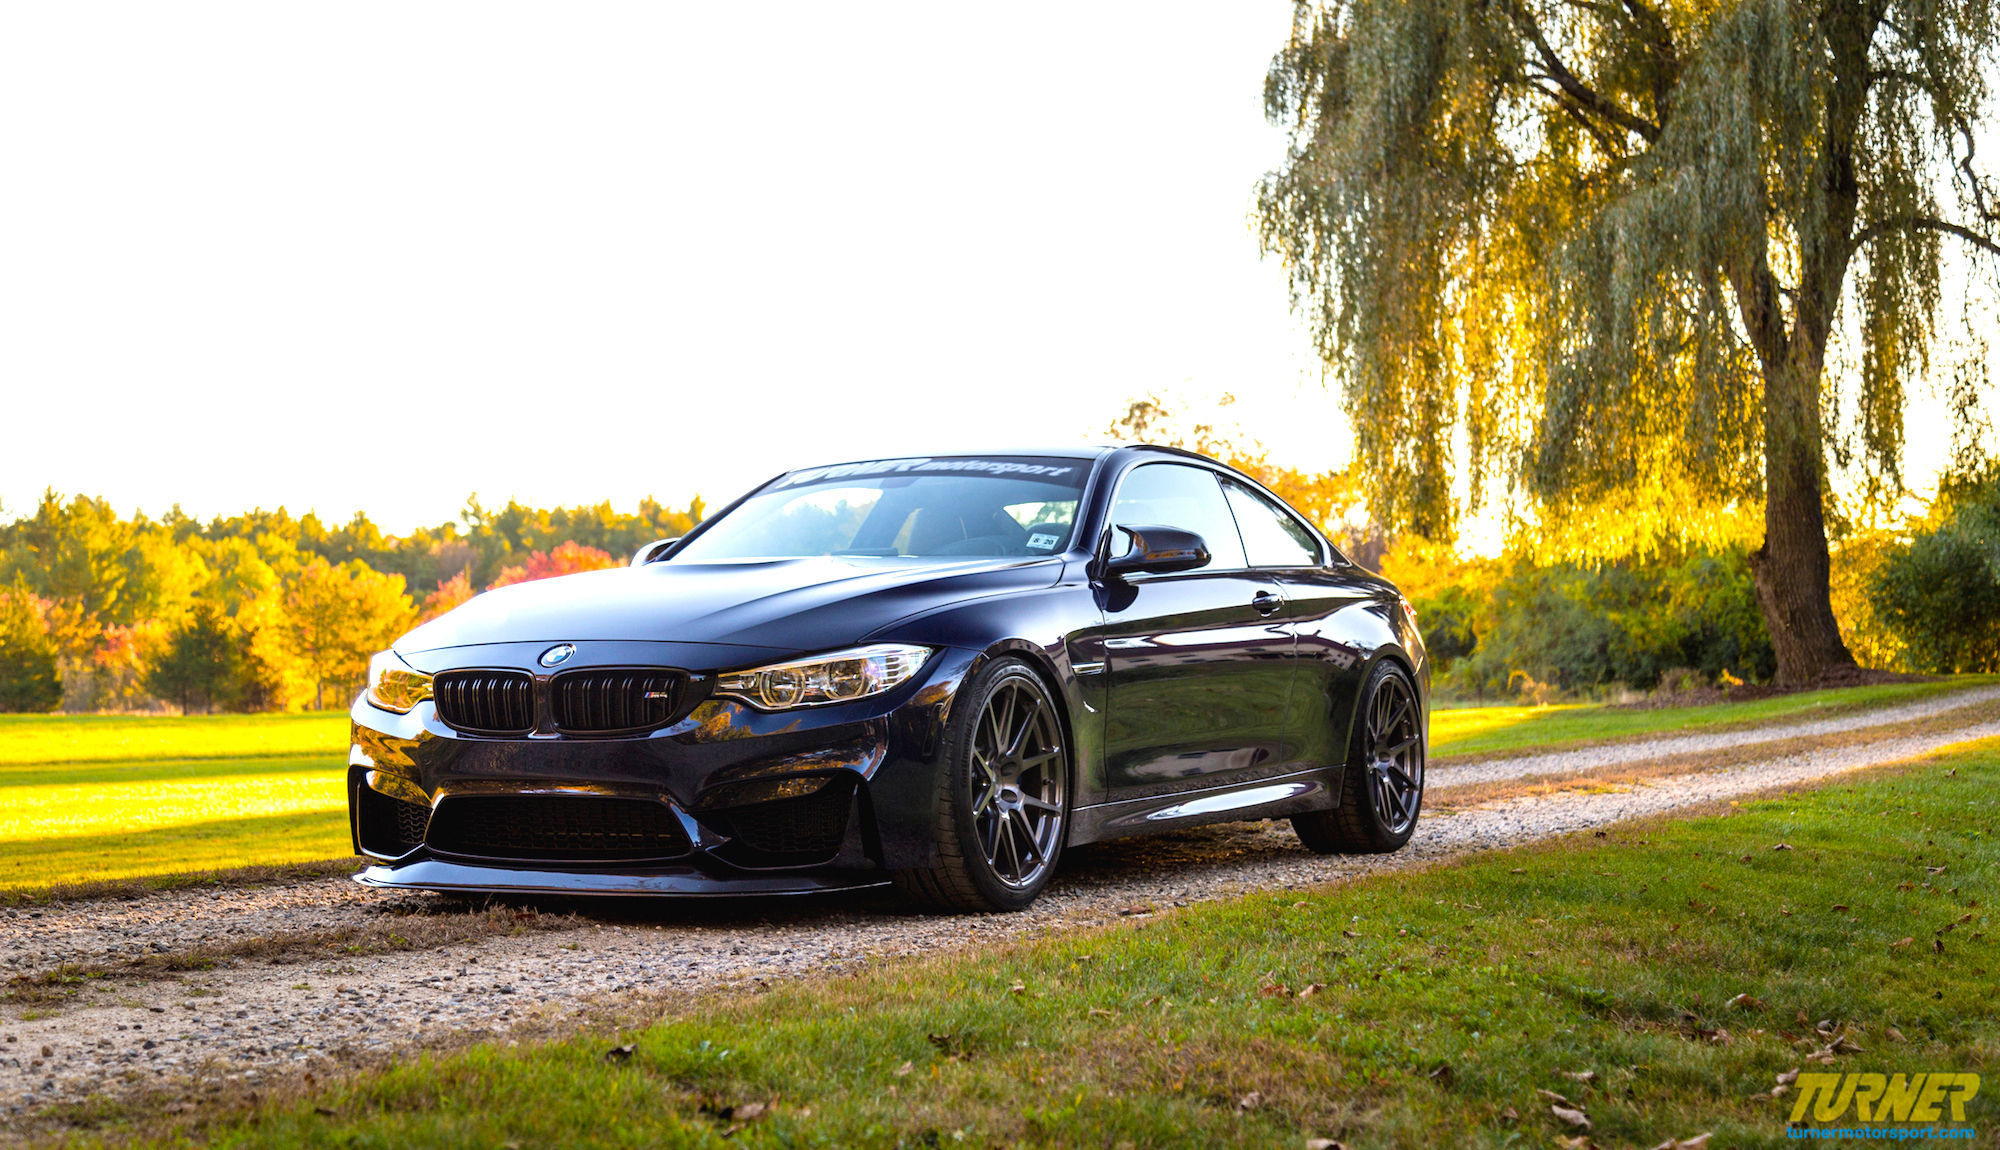 2016 BMW M4   Turner Motorsport F82 BMW M4 on Forgeline GA1R Wheels